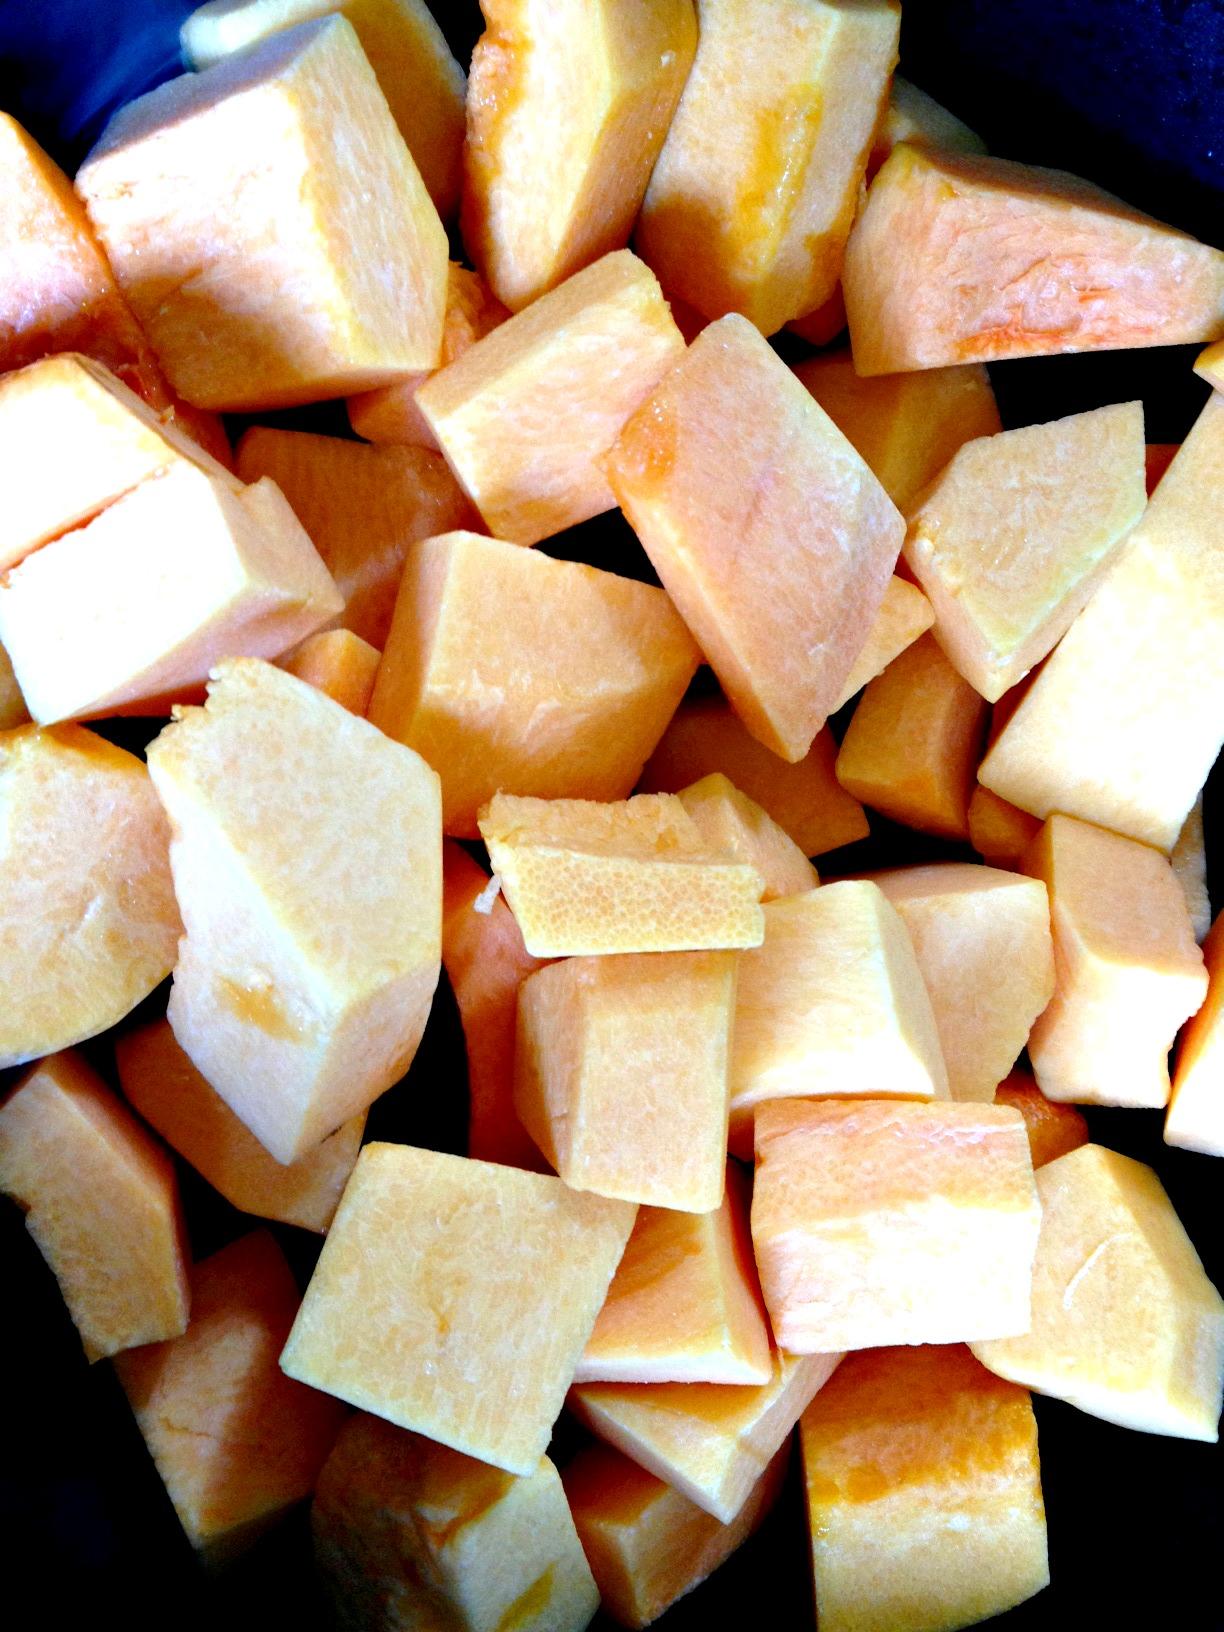 Butternut squash mac n cheese (dairy optional)